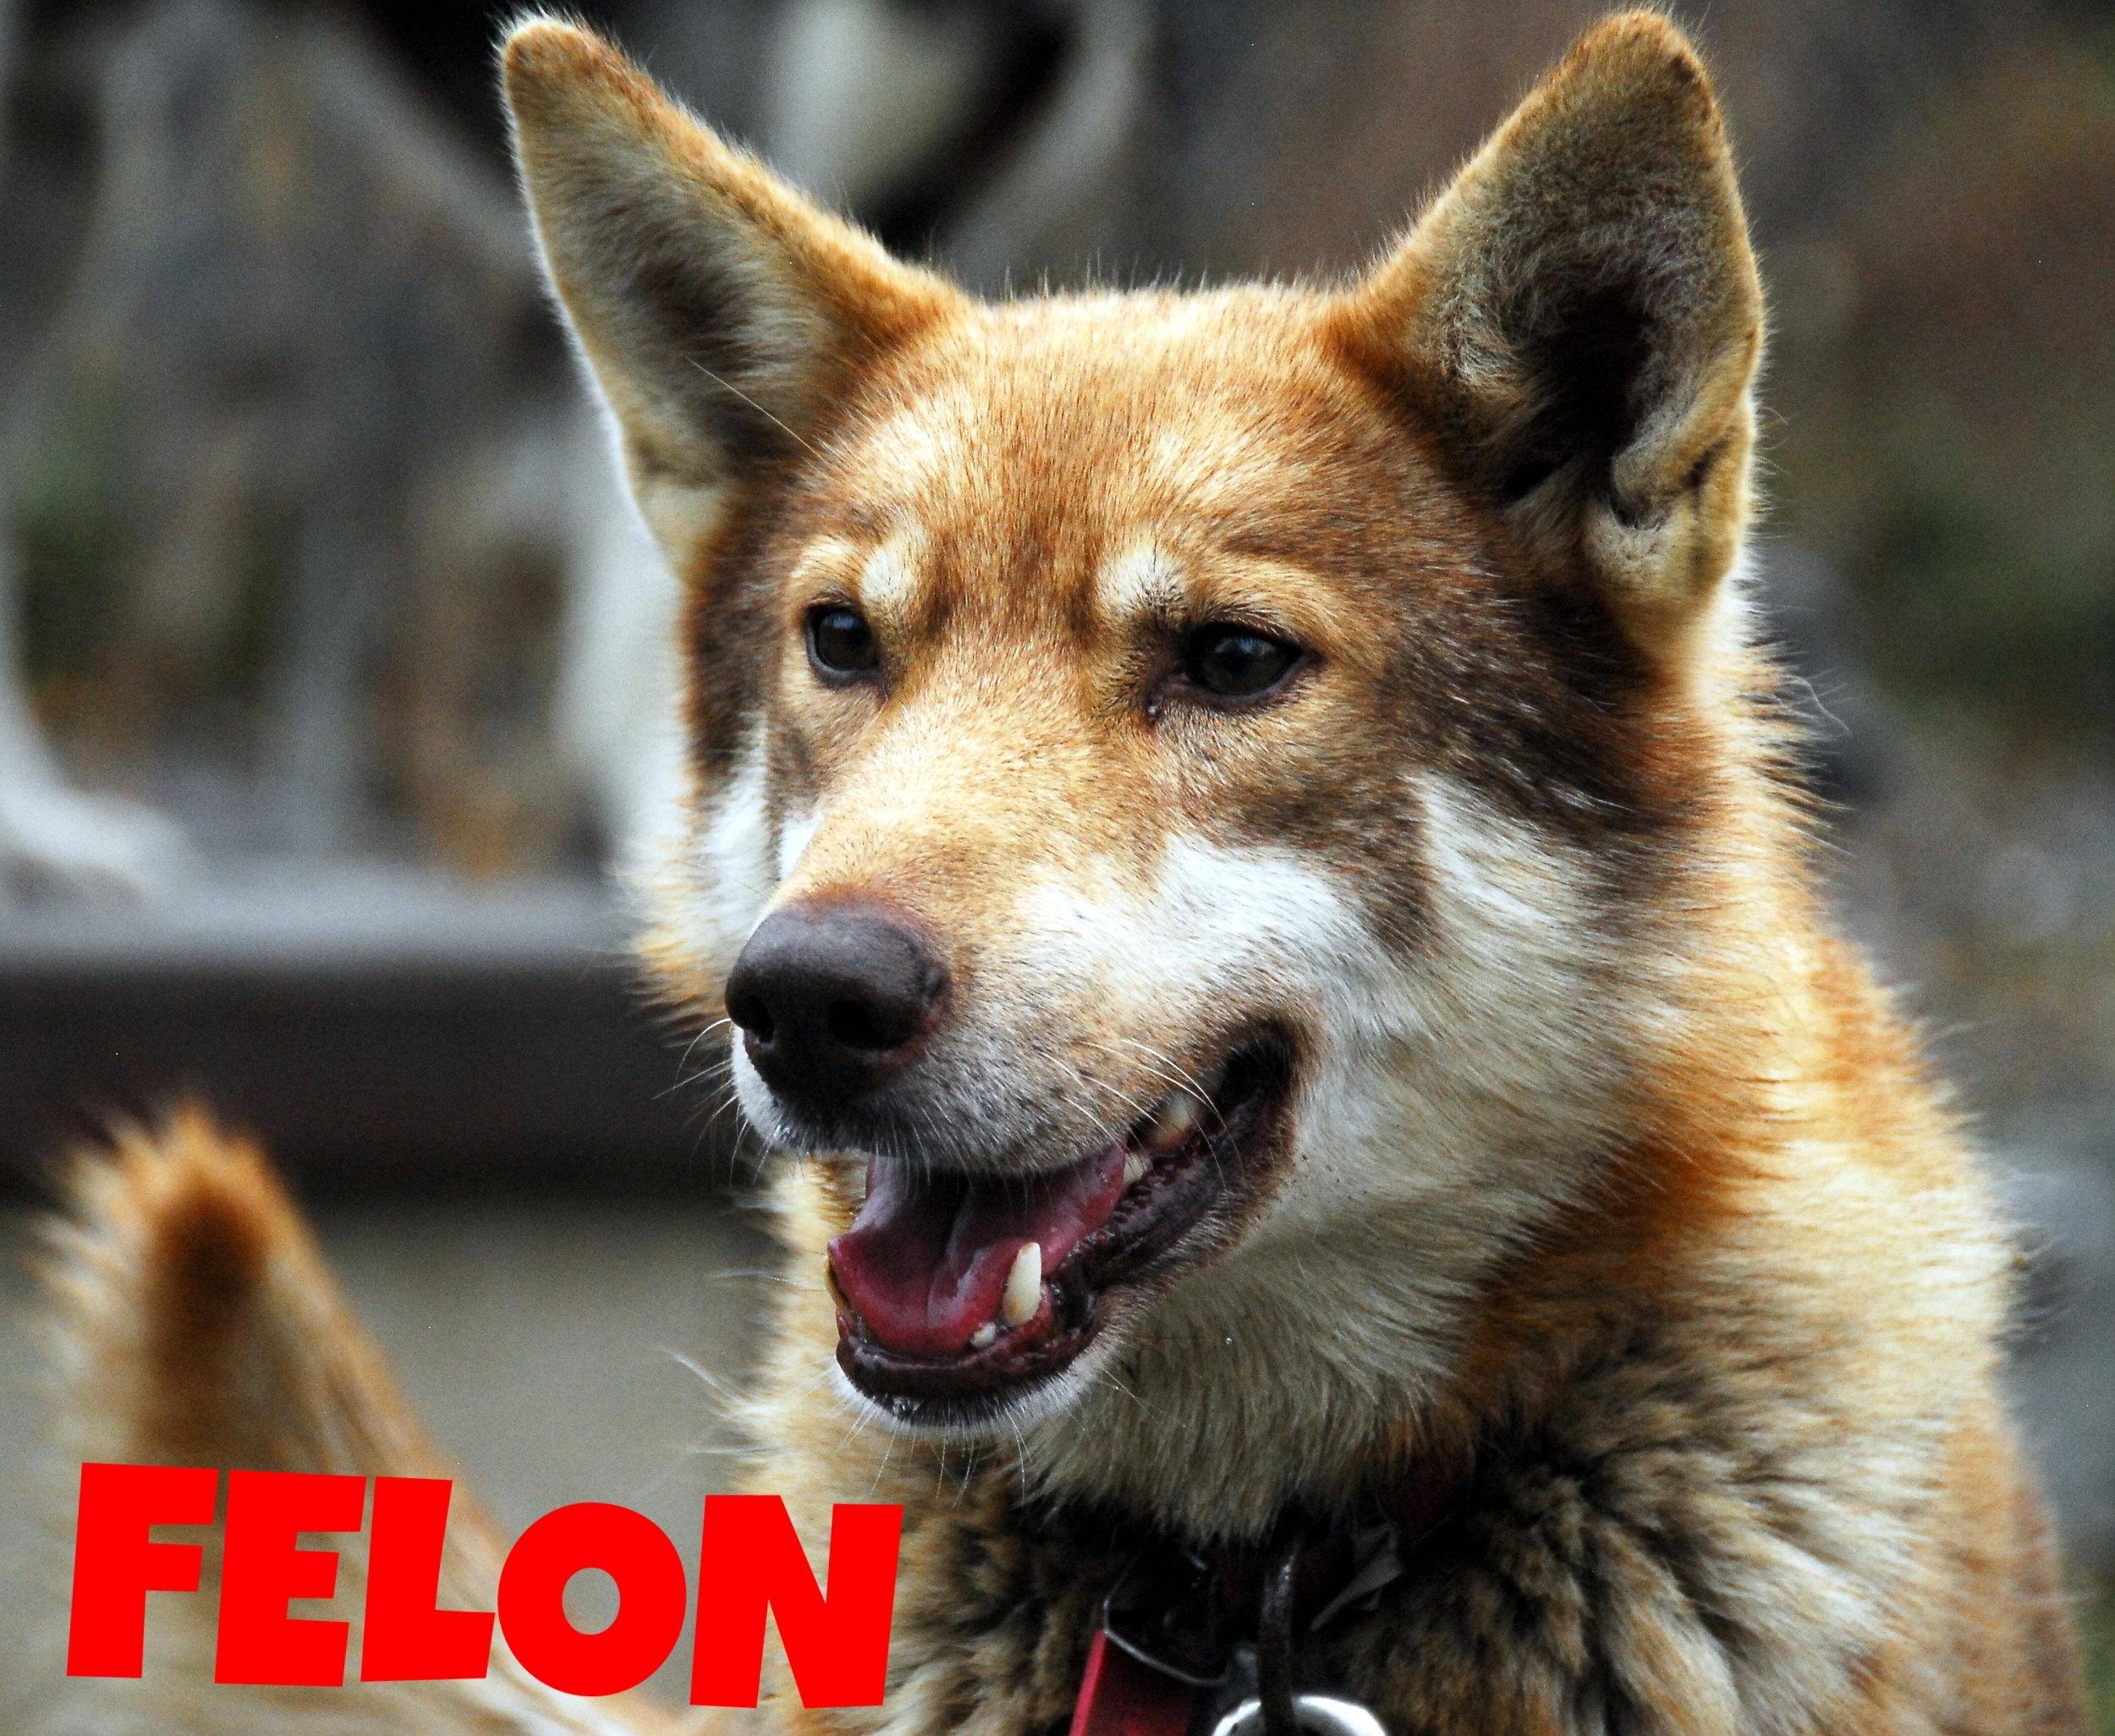 Felon.JPG